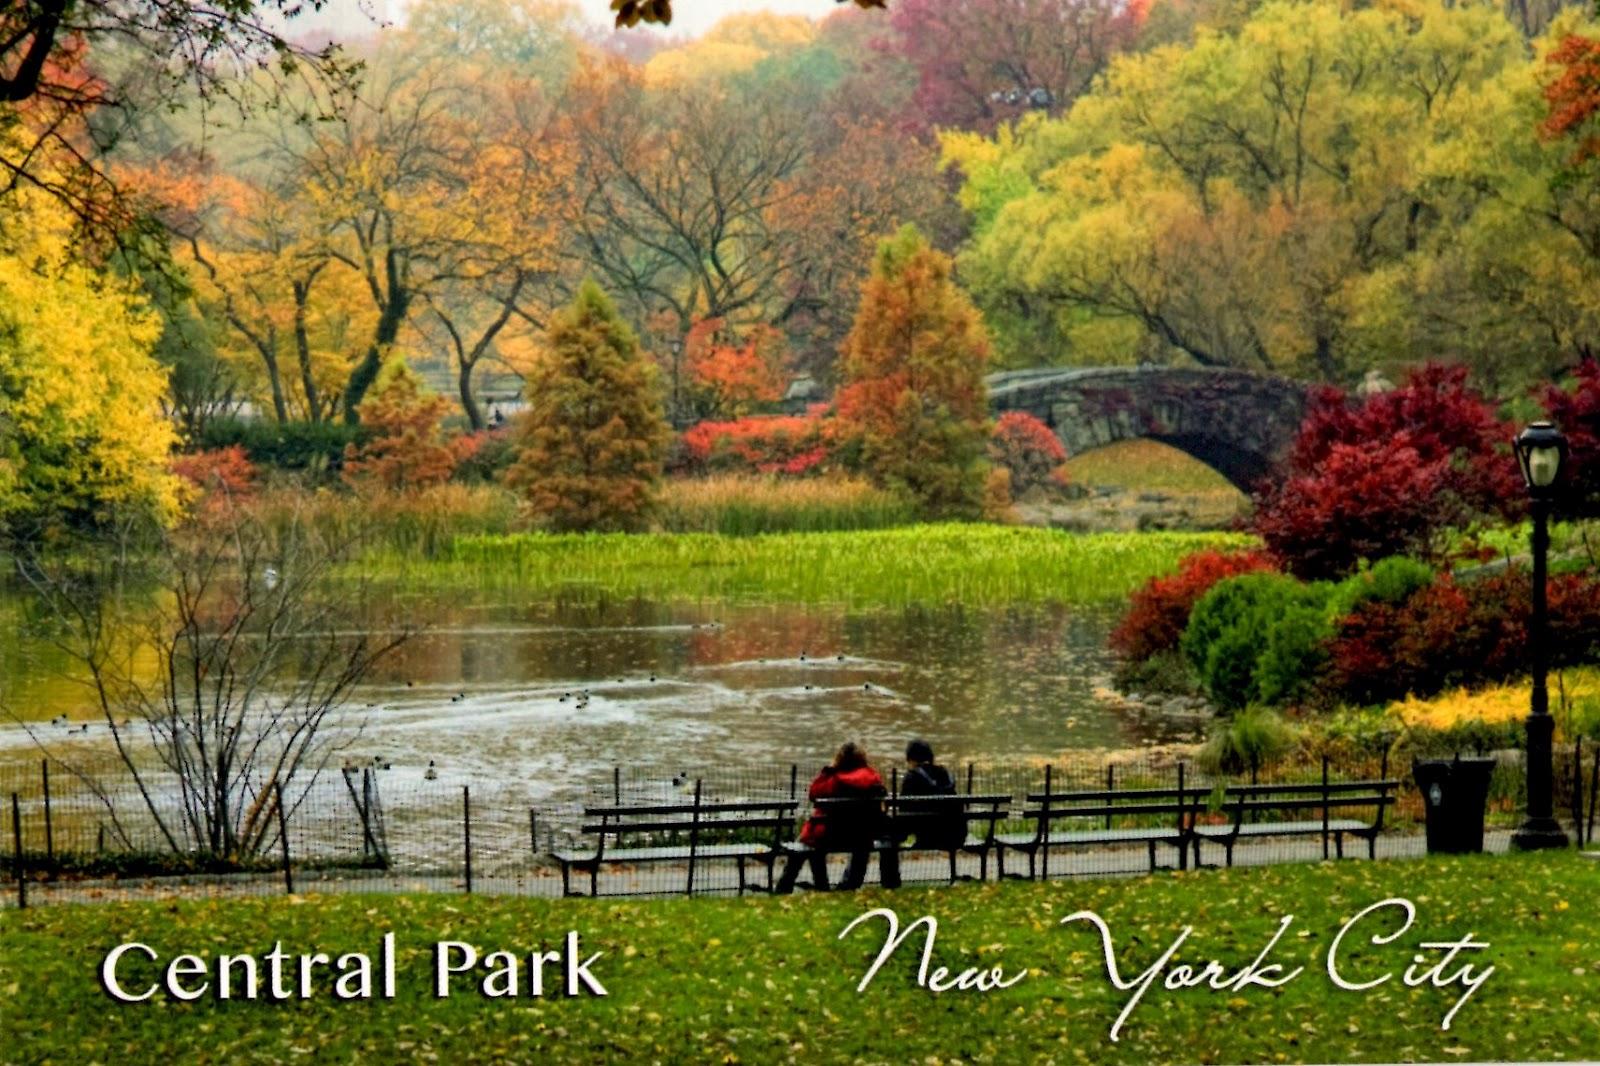 Fall In Central Park 1600x1066 pixel Popular HD Wallpaper 5451 1600x1066